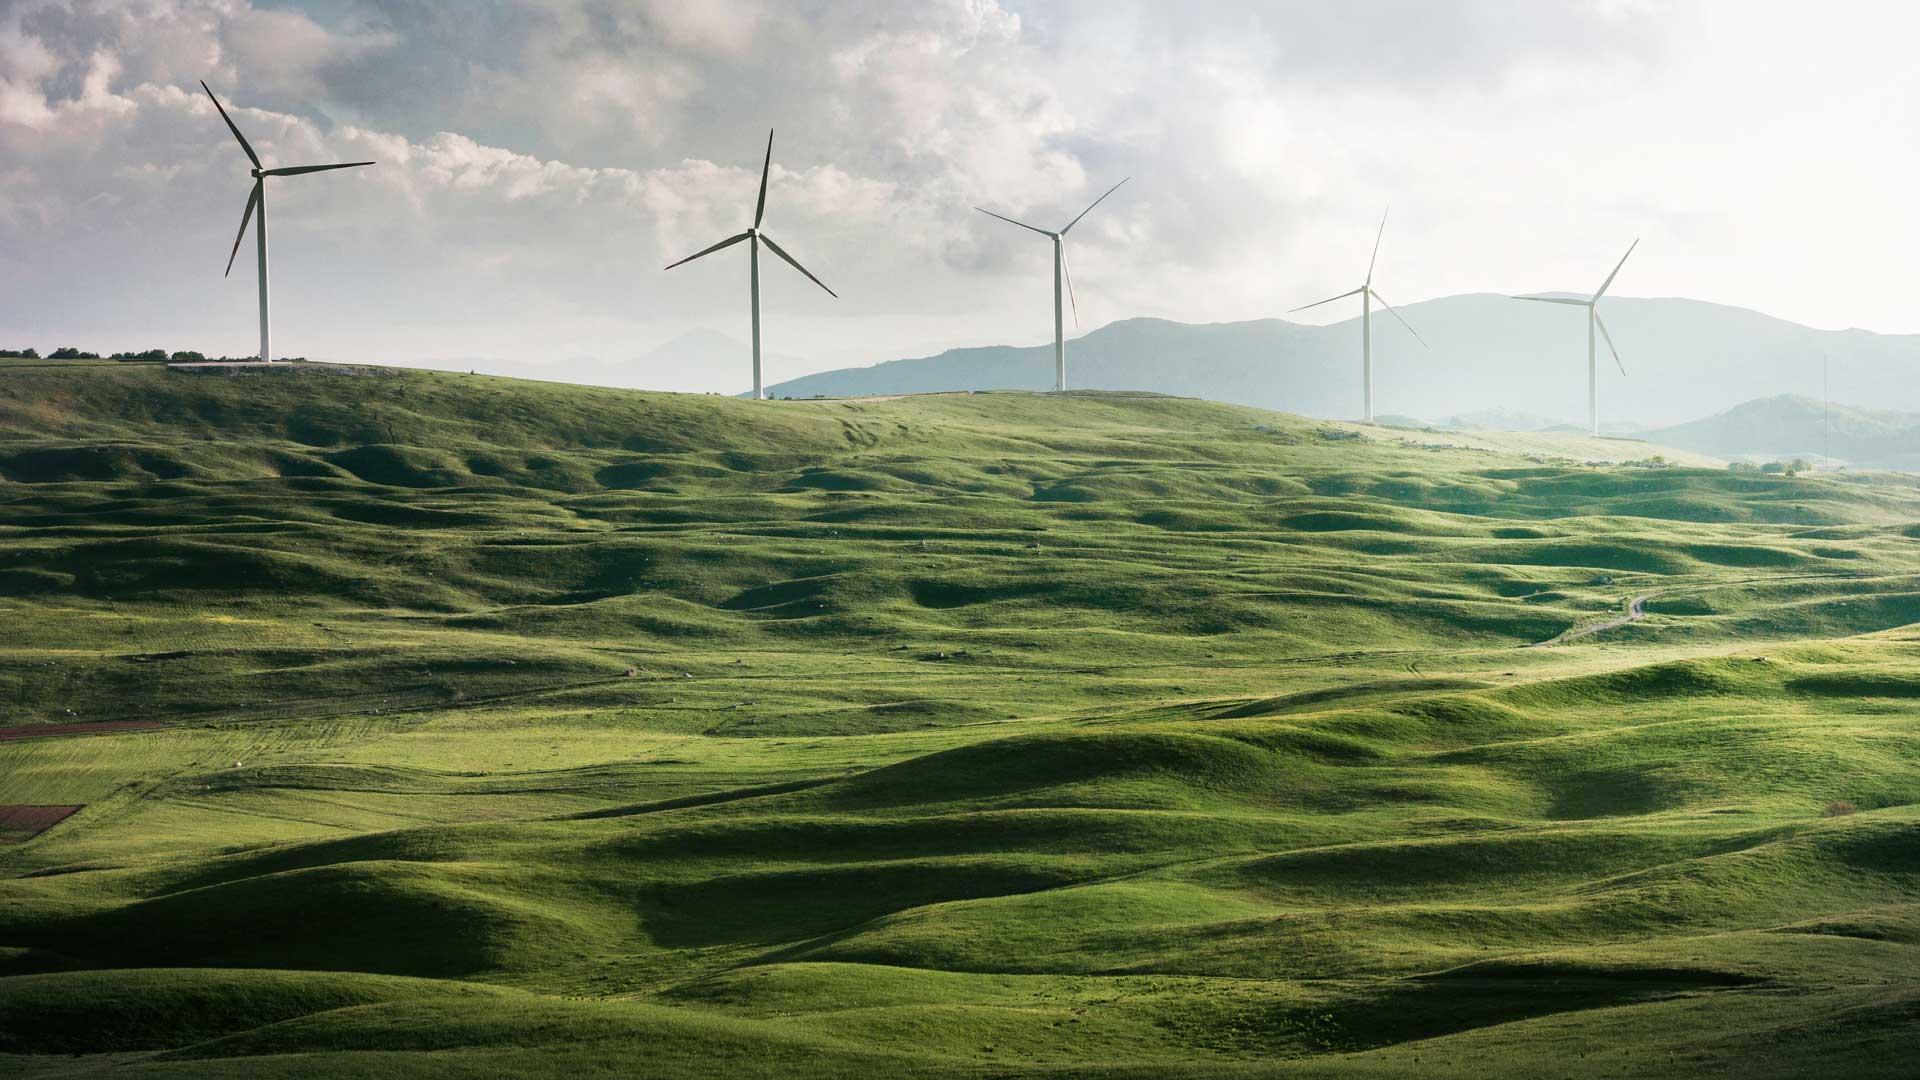 Hügel mit Windrädern.